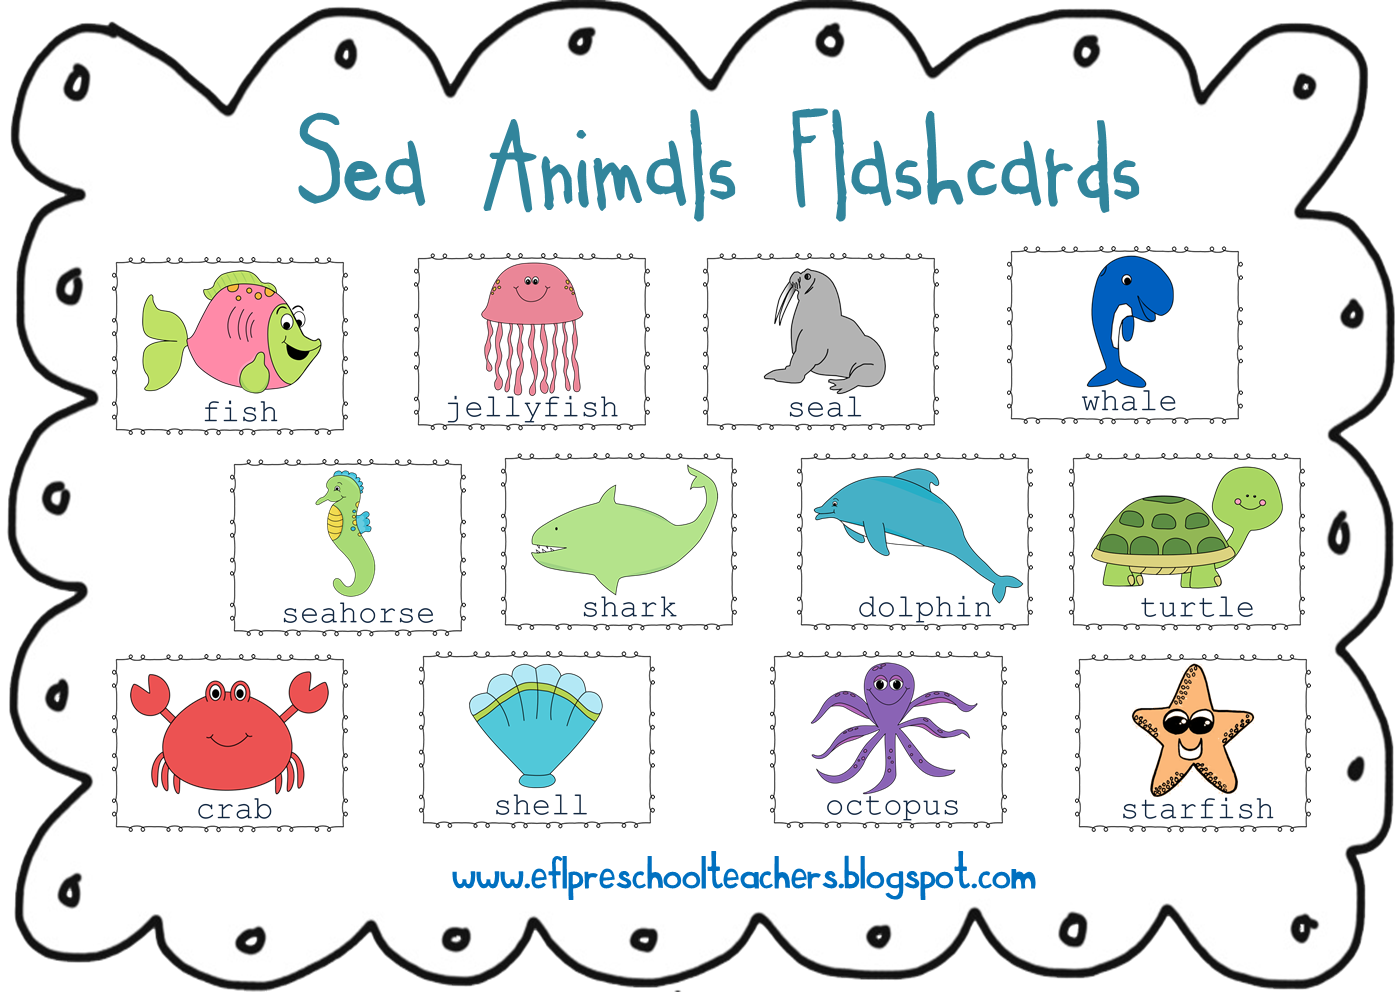 Shell clipart sea animal. Esl efl preschool teachers